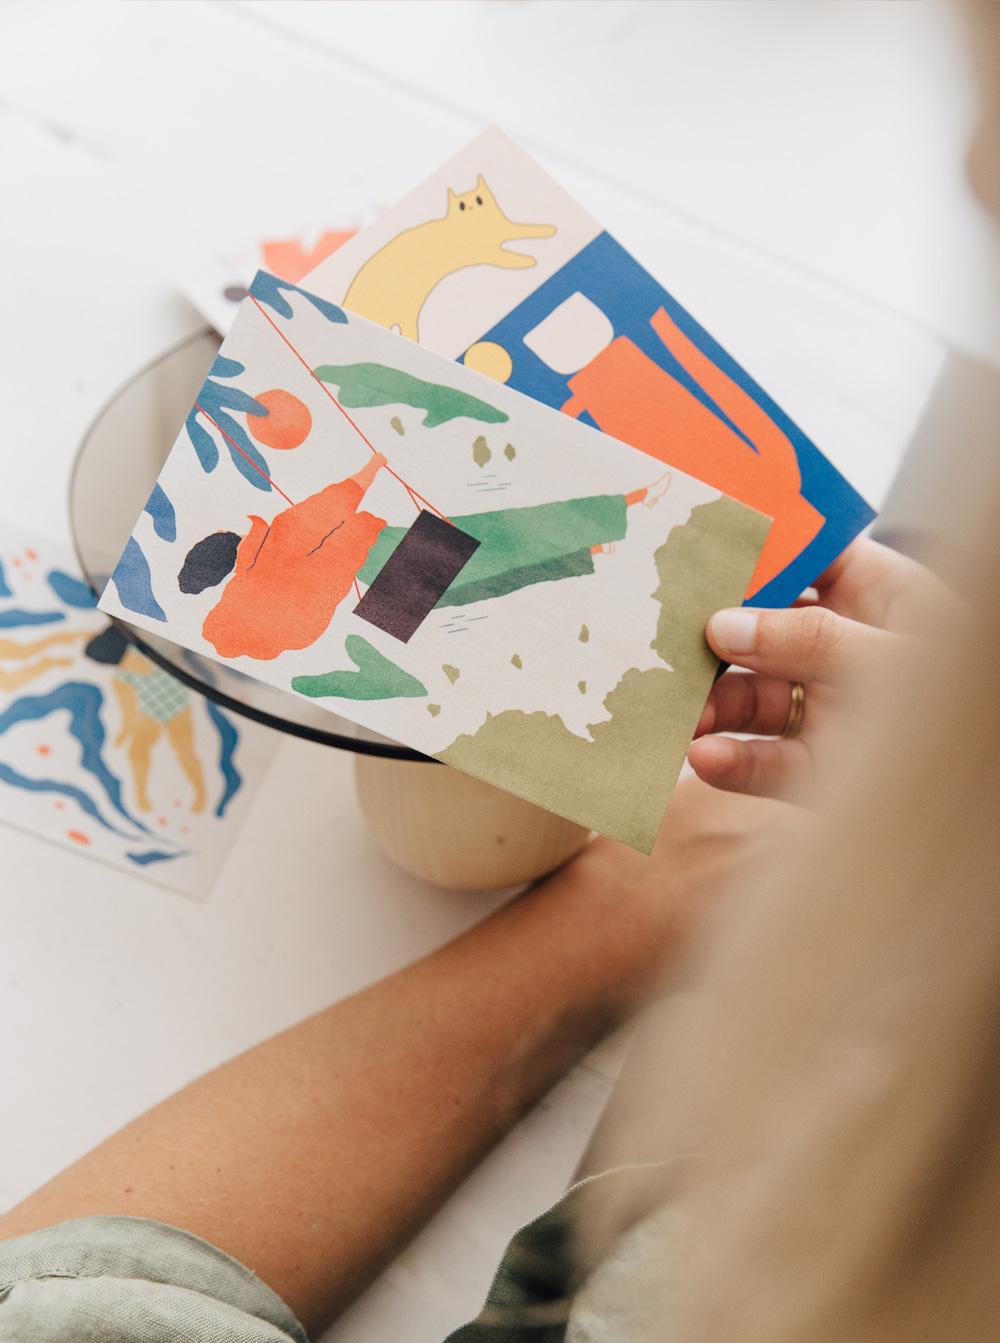 Postal balanceo Conecta ilustrada por Studio Patten - Better by Letter